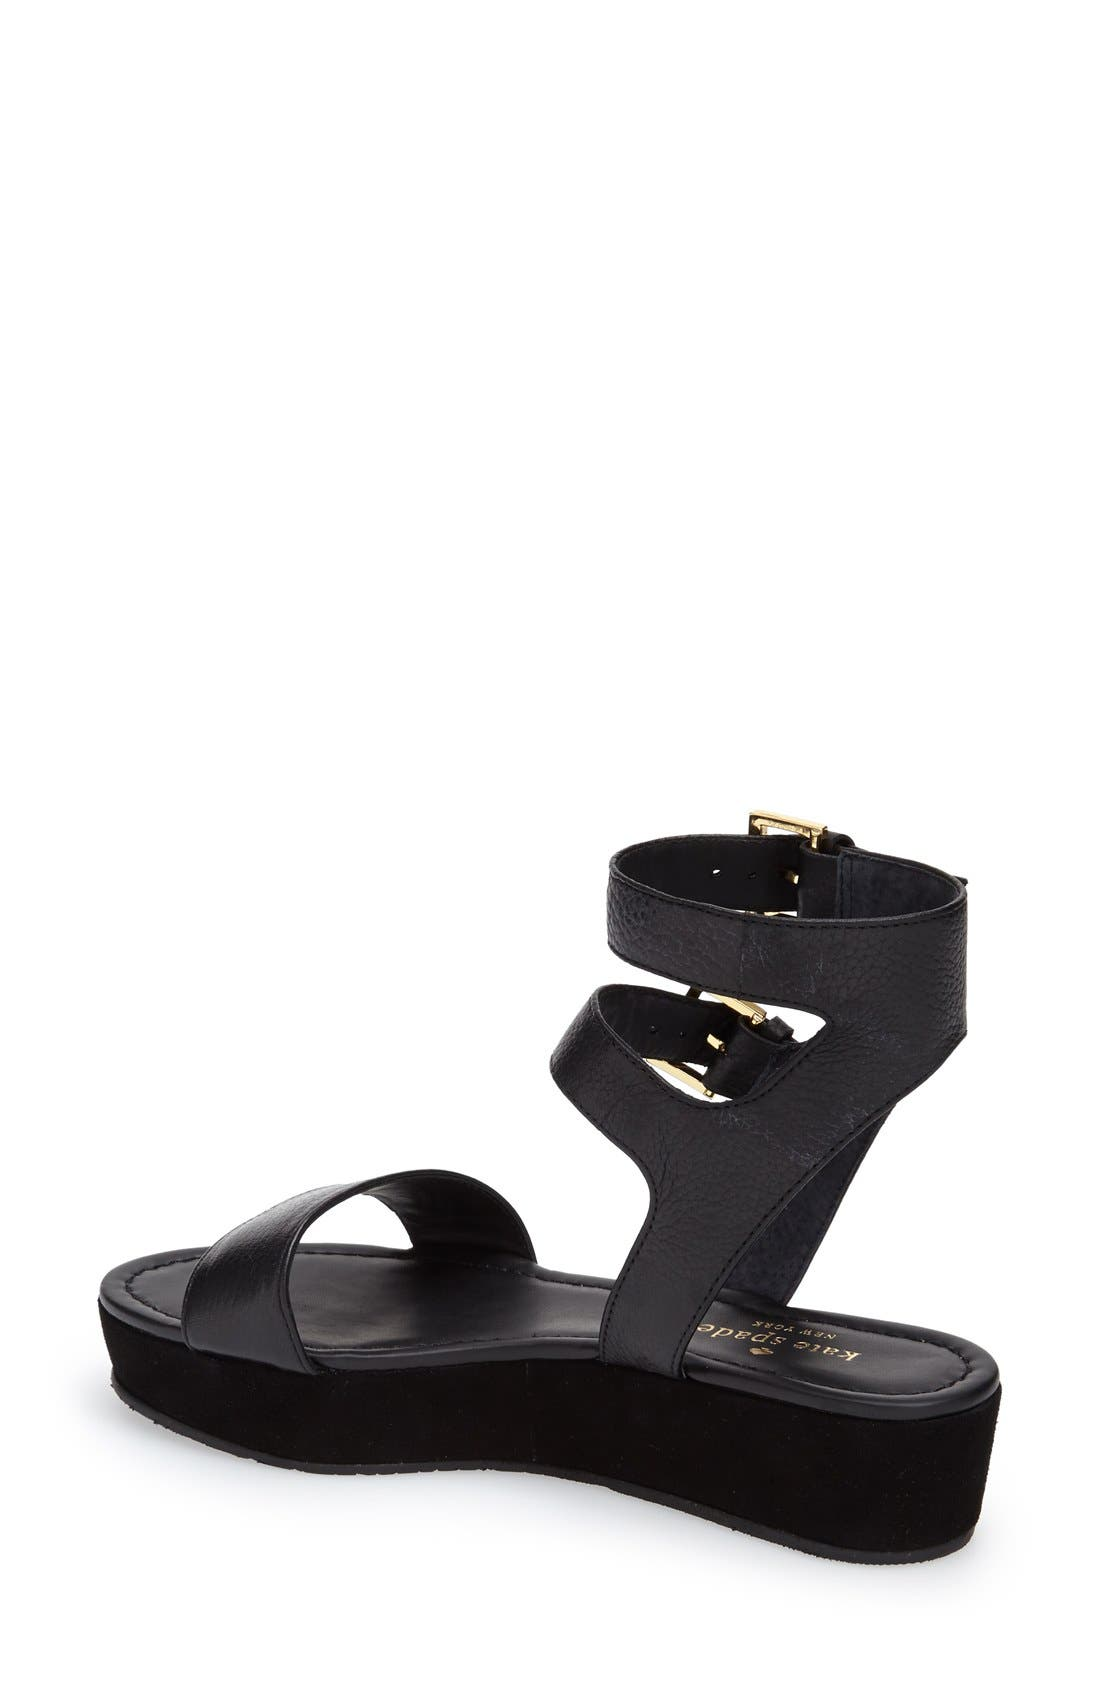 Alternate Image 2  - kate spade new york 'troy' platform sandal (Women)